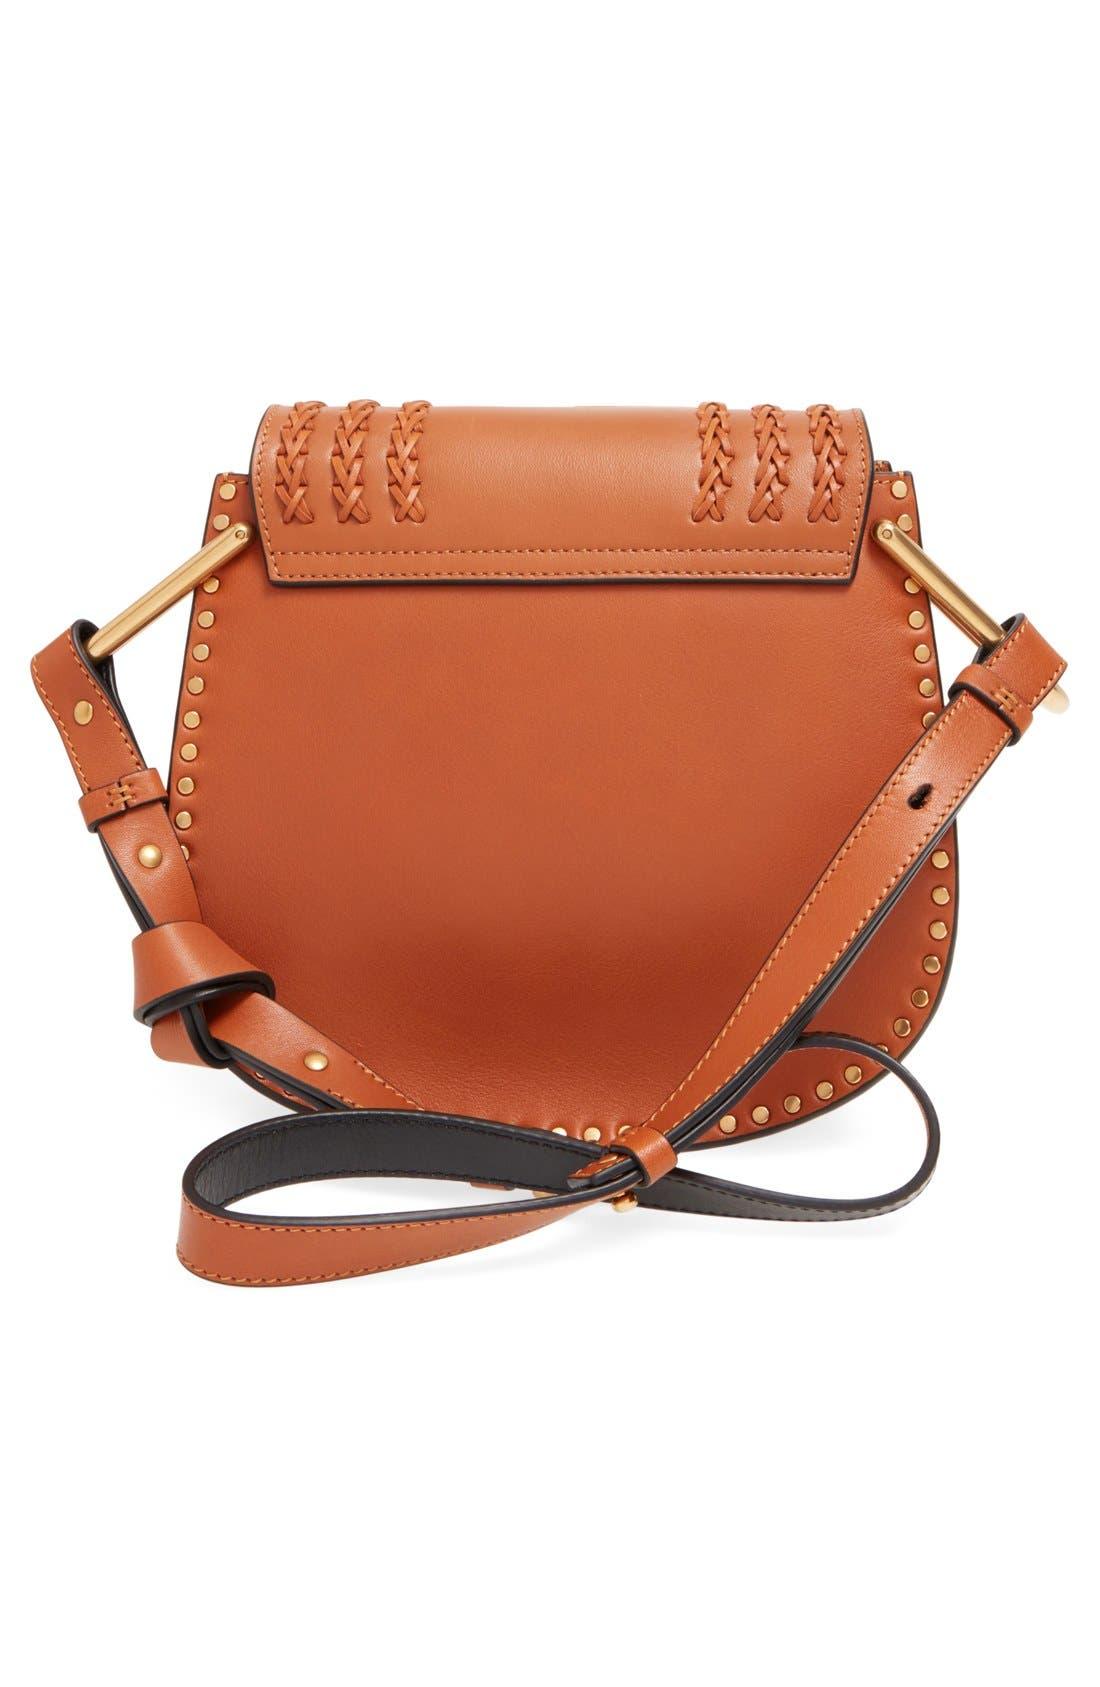 'Small Hudson' Studded Calfskin Leather Crossbody Bag,                             Alternate thumbnail 7, color,                             Caramel